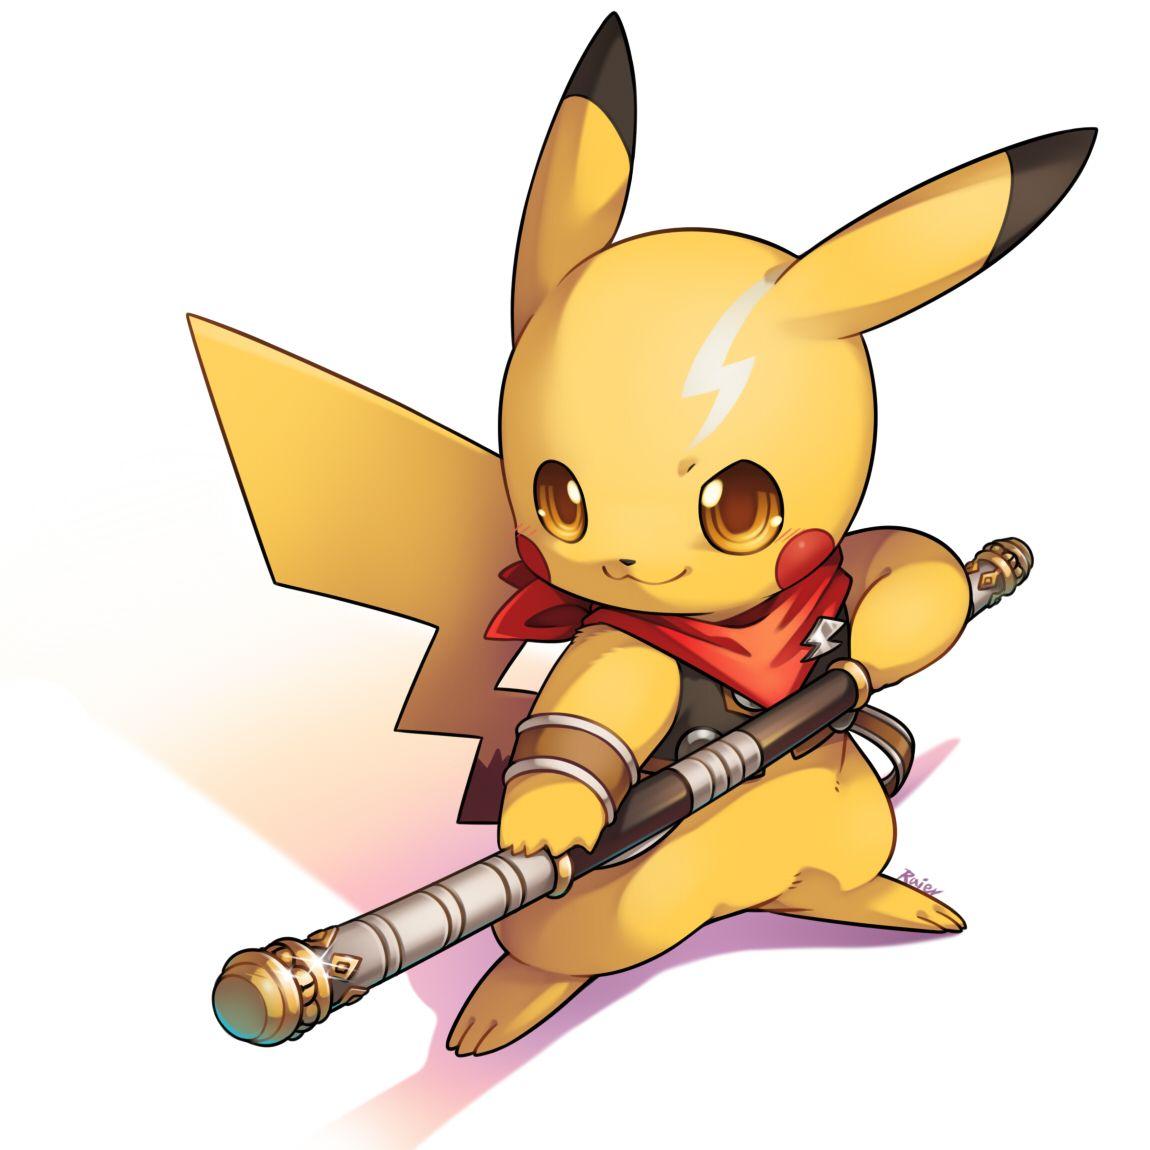 Raier Pokemon Pikachu Badge No People Looking Ahead Pokemon